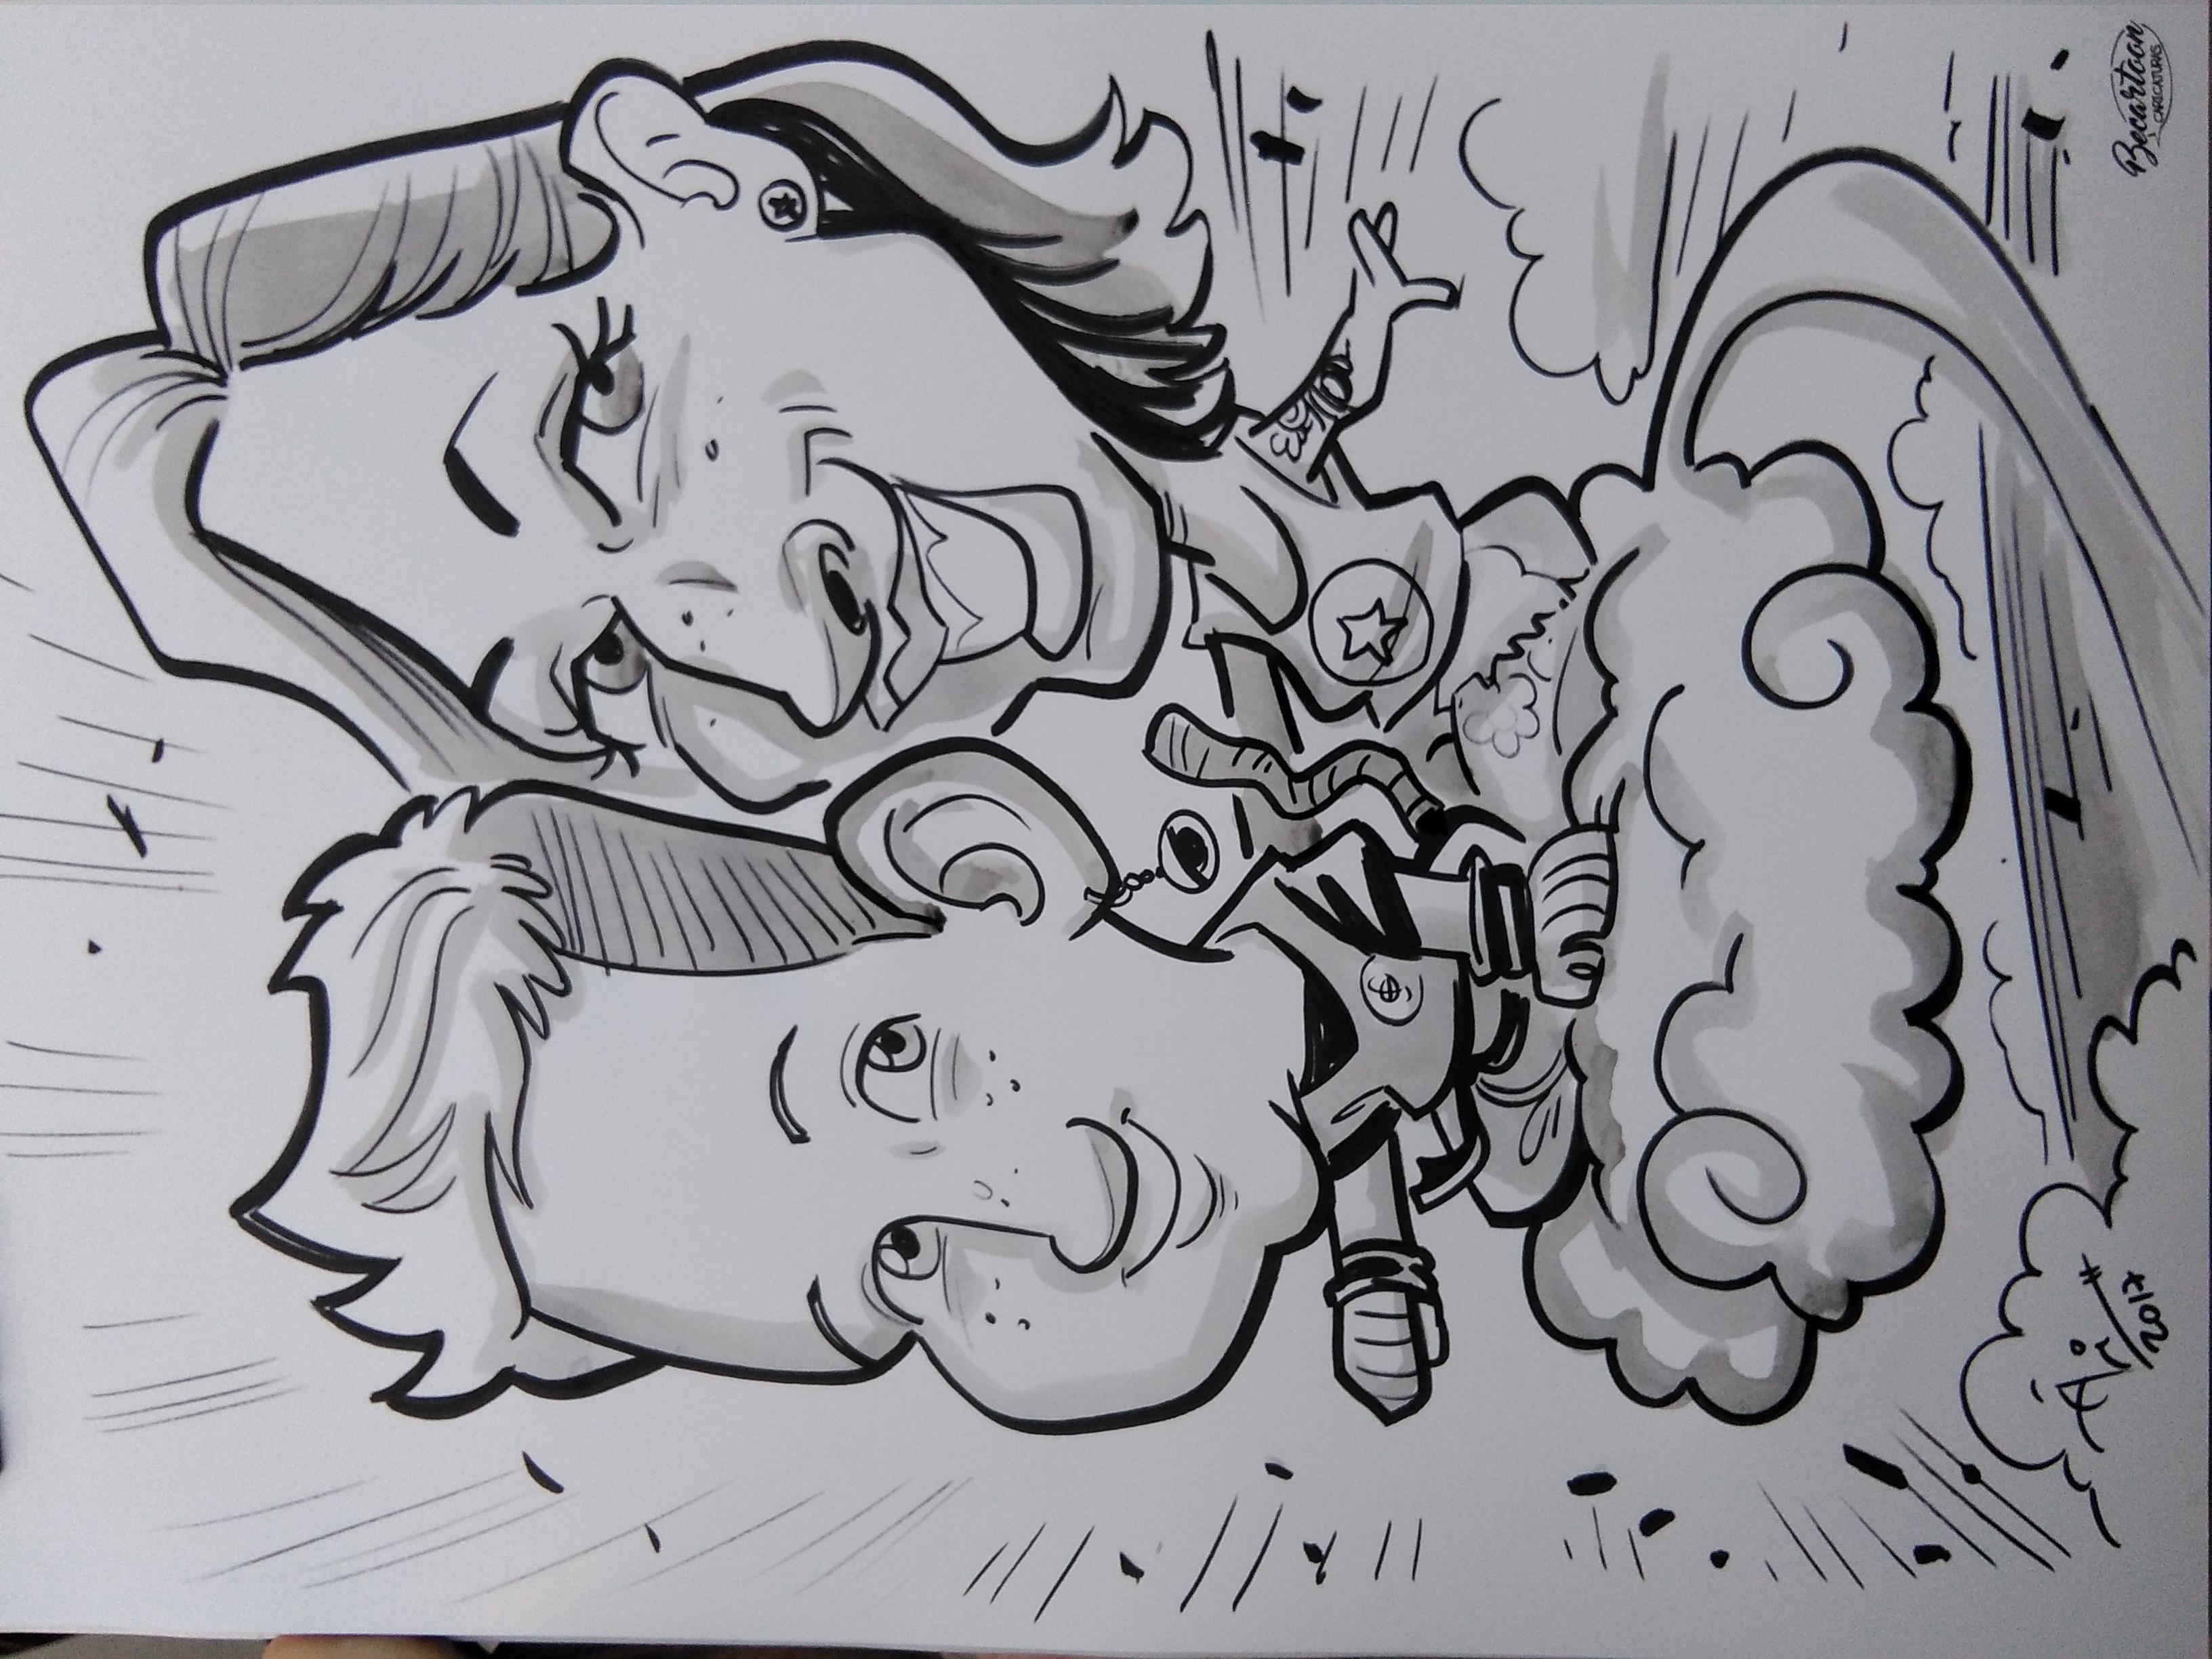 Caricatura_eventos dragonball.jpg